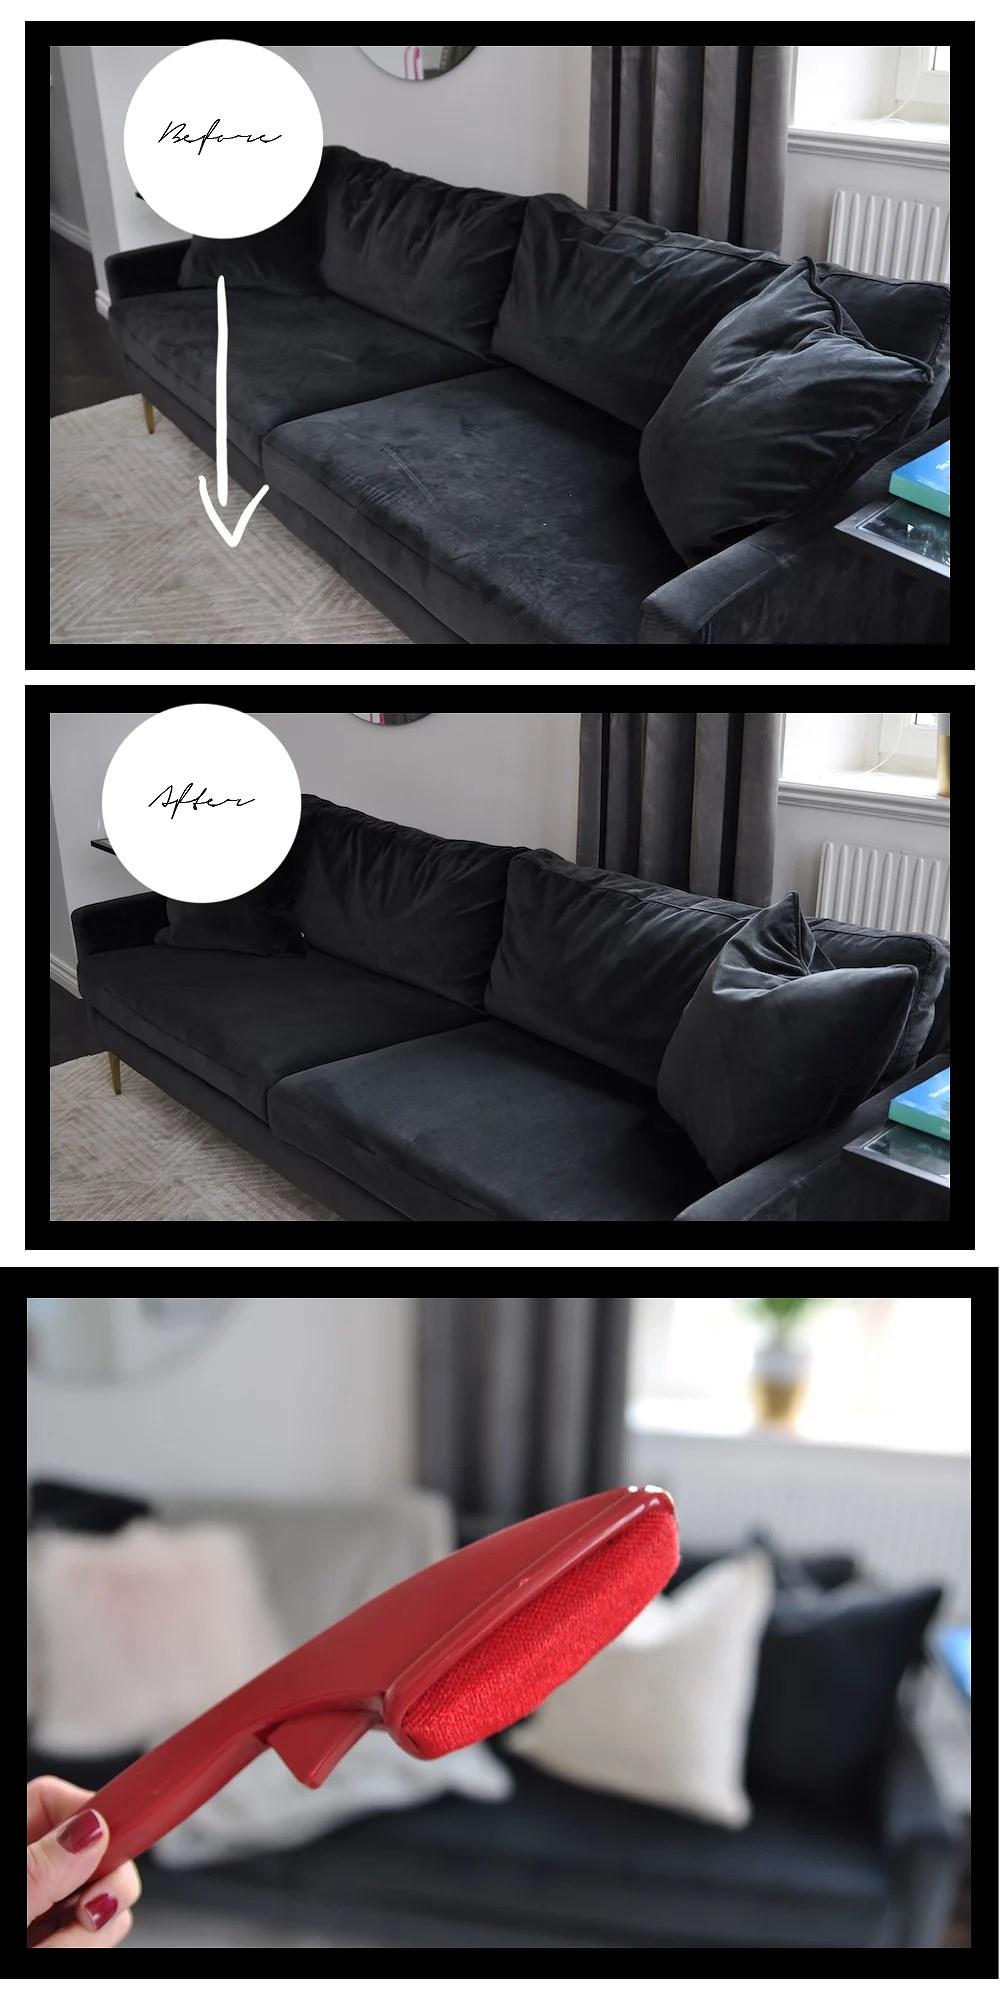 Quickest, easiest way to clean velvet furniture!